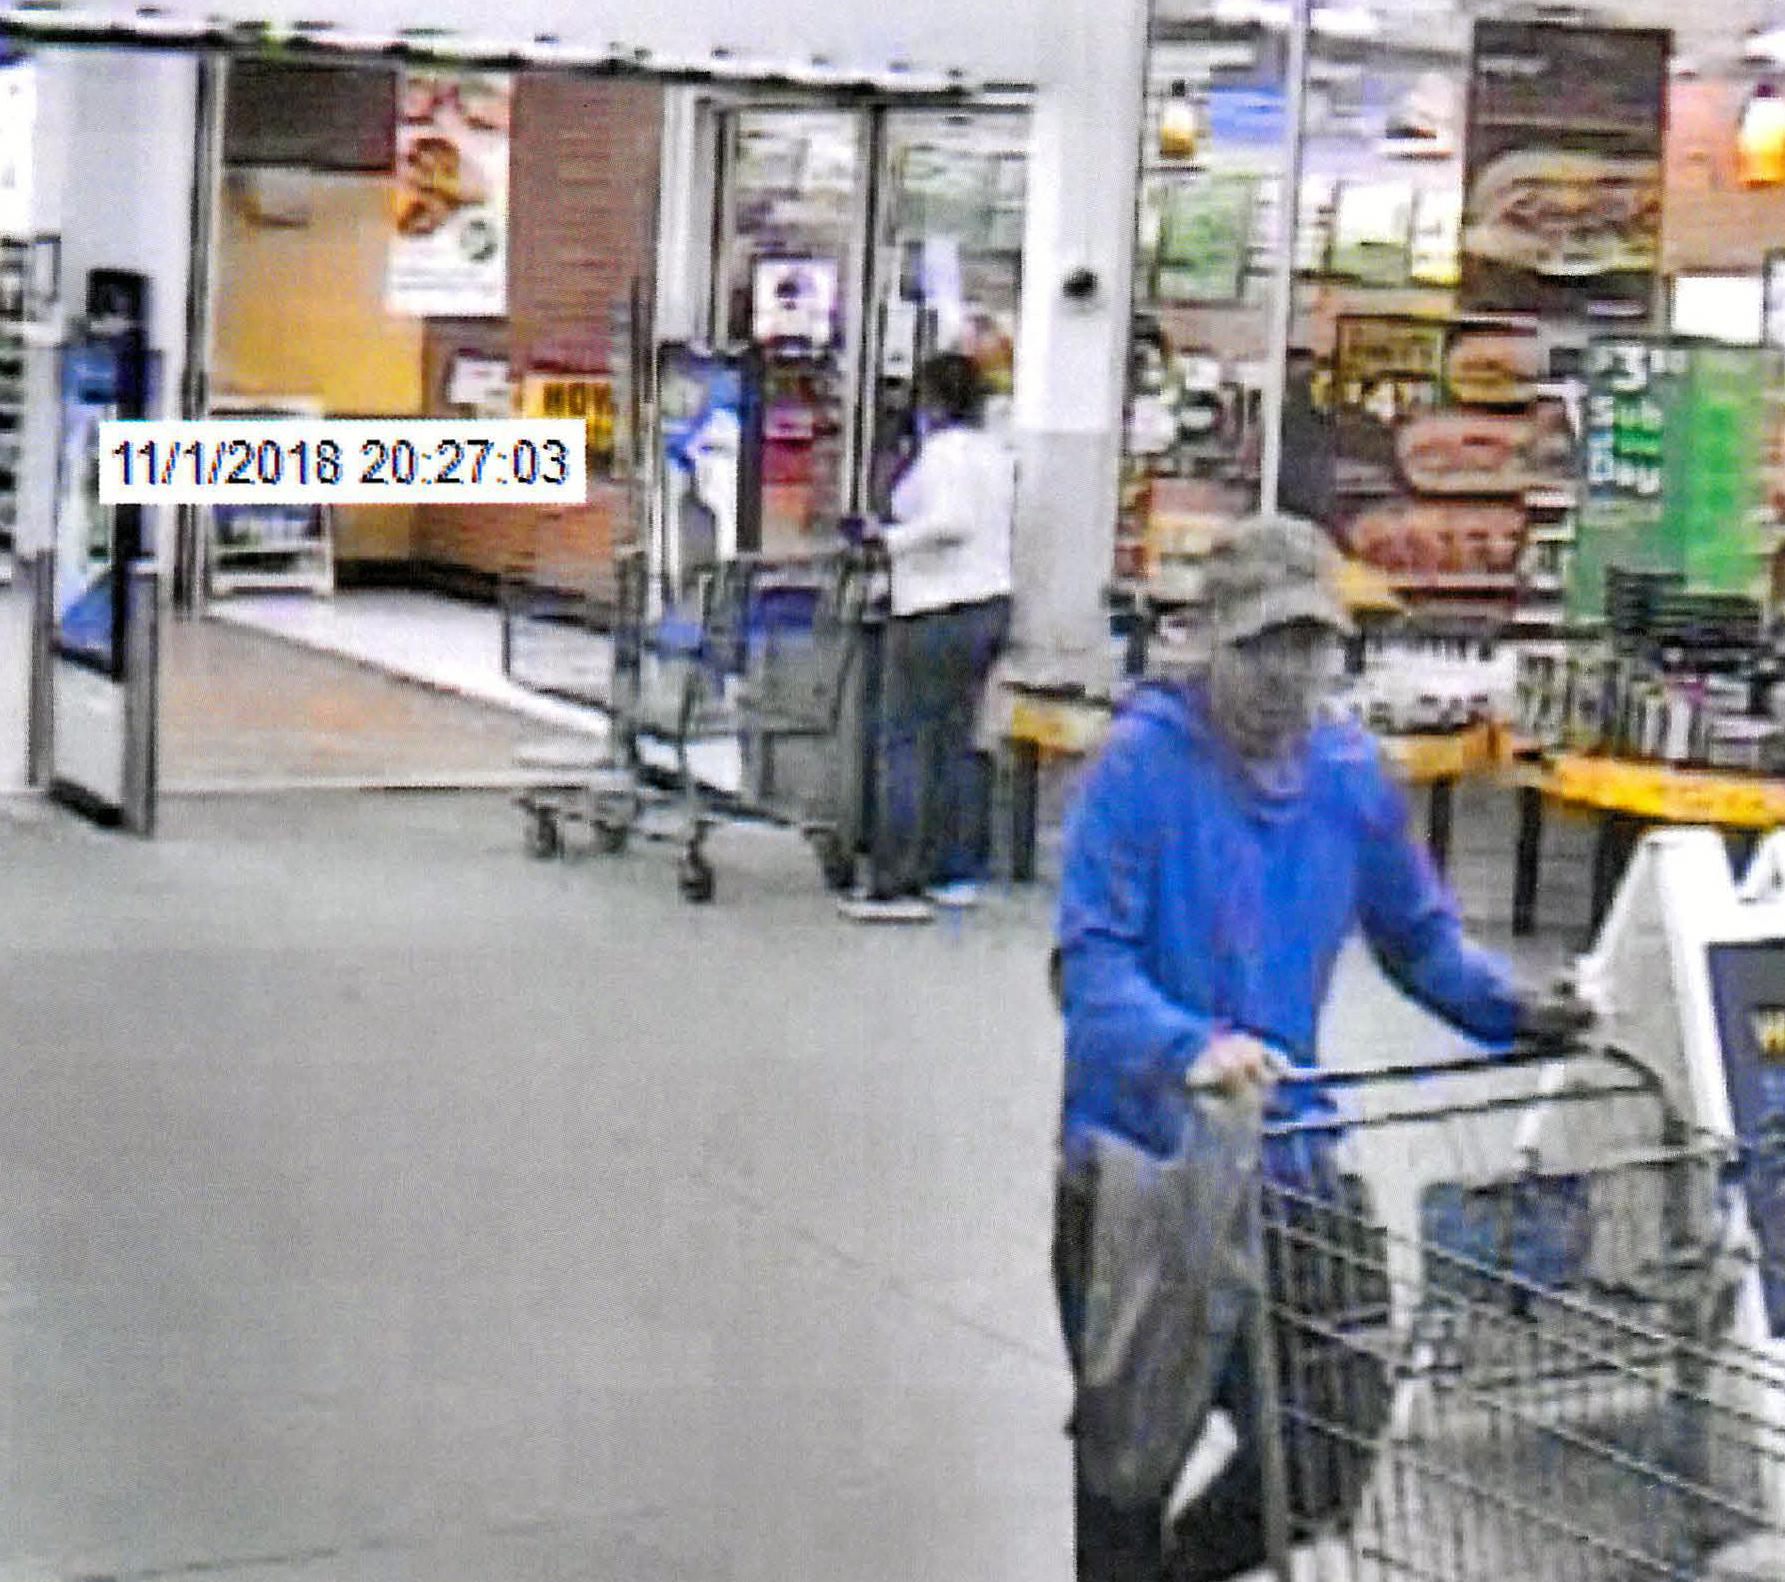 Flipboard Report Police Identify Suspect In Colorado: Police Need Help Identifying Man